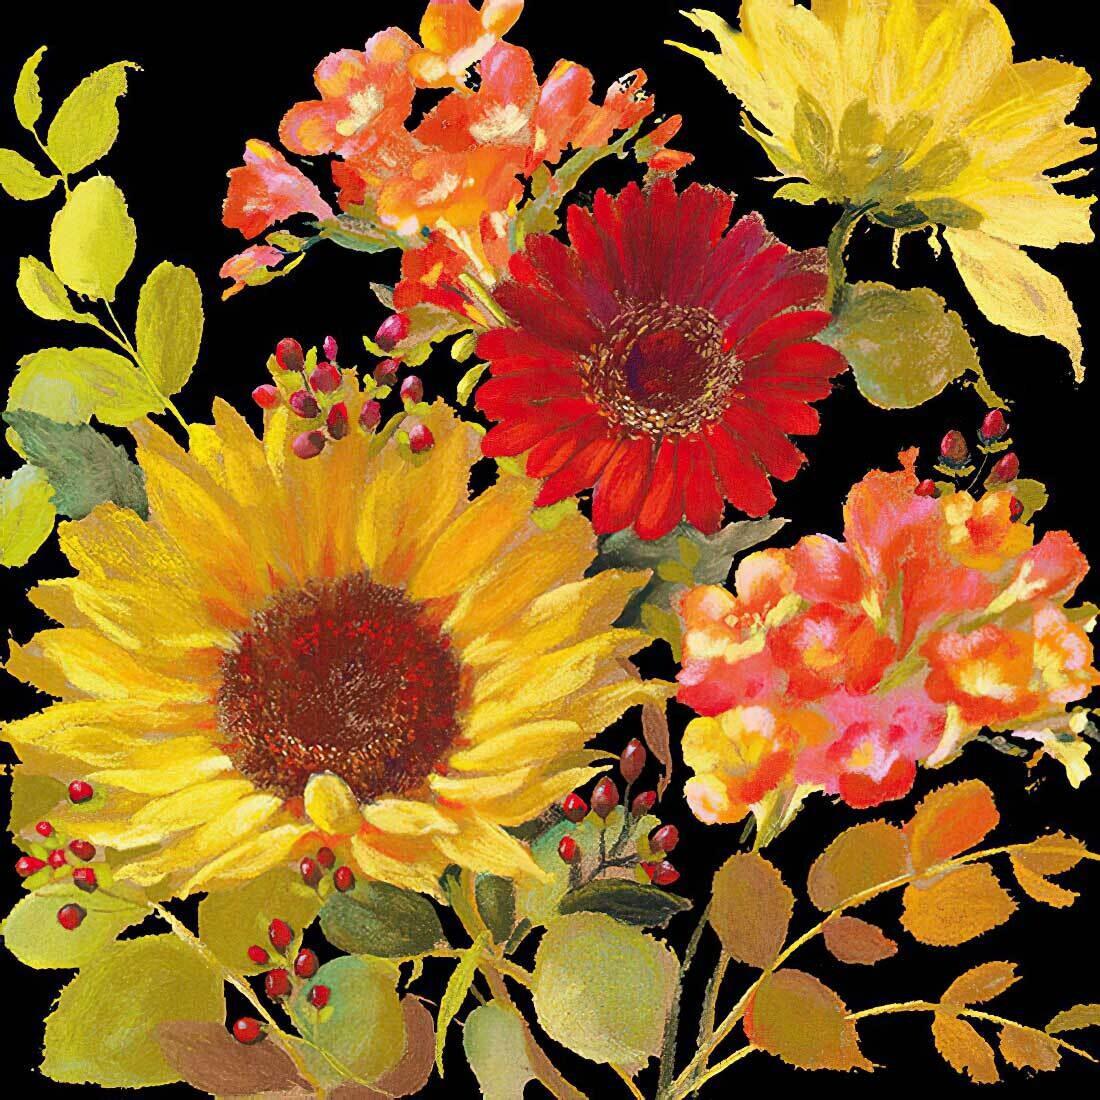 Decoupage Paper Napkins - Floral - Sunny Flowers Black 13x13 (1 Sheet)